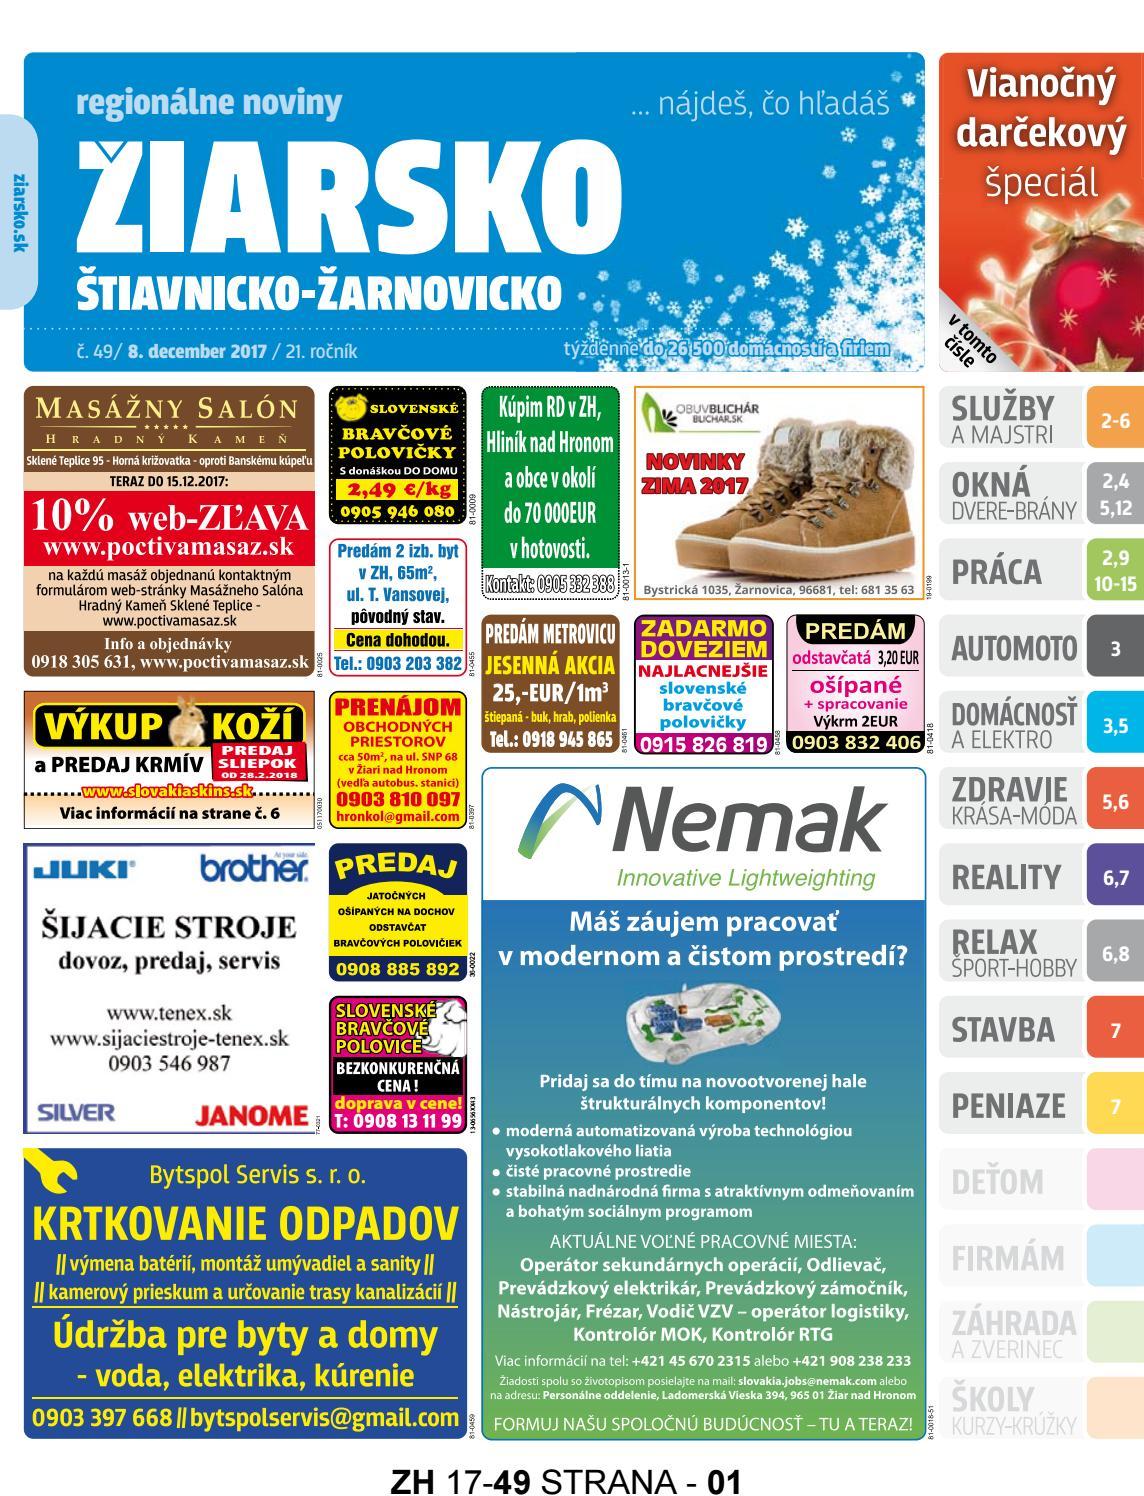 román Zoznamka kontrak 24